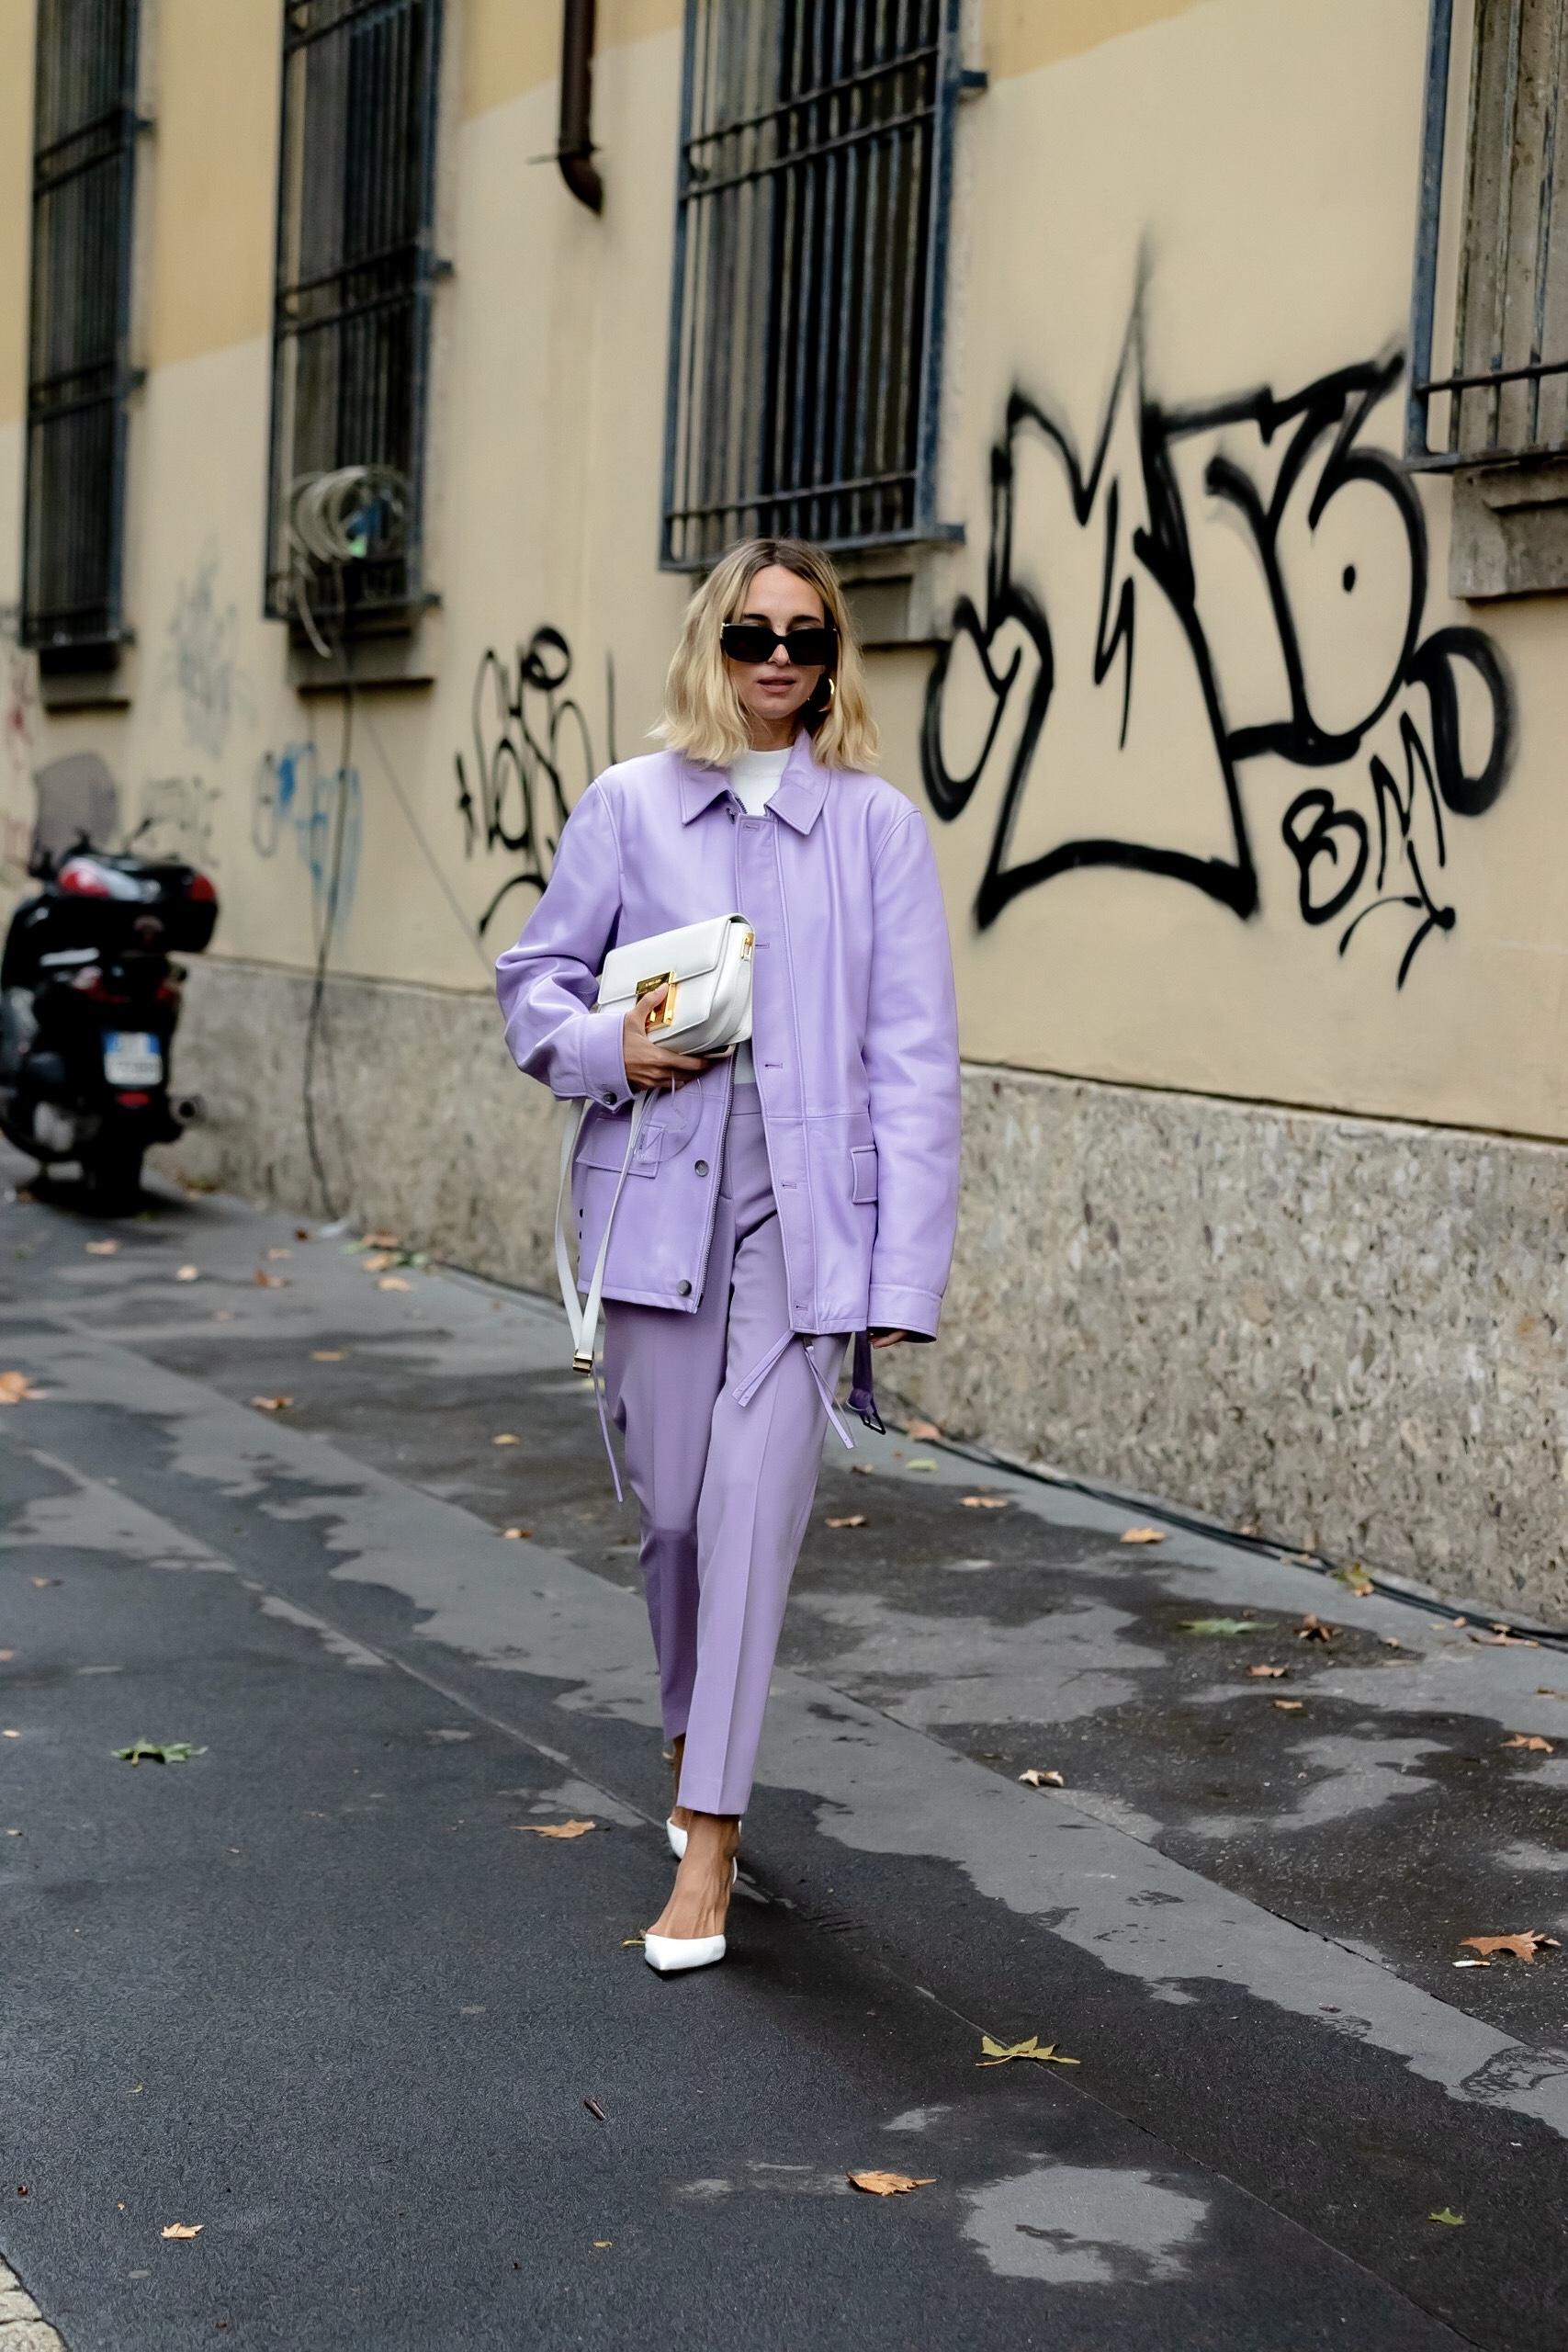 Milan Spring 2021 Day 3 Street Style by Nick Leuze Photos